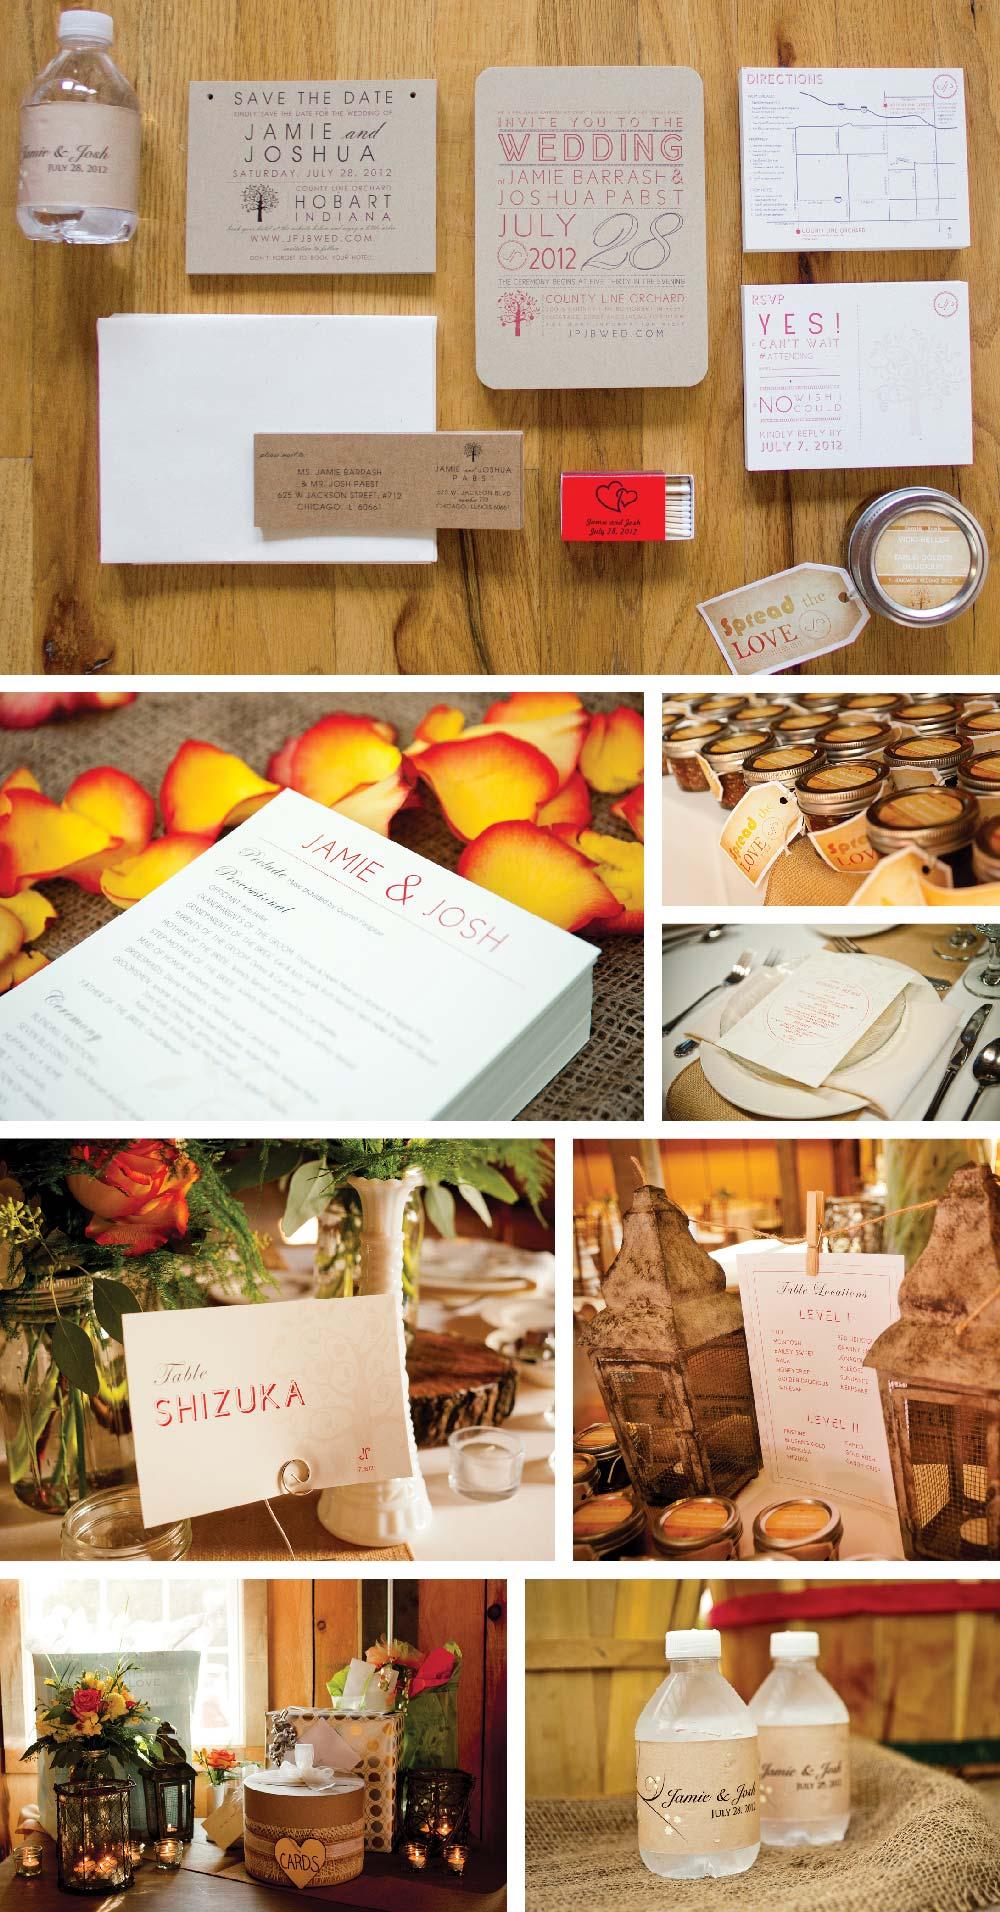 Wedding Invitation County Line Orchard Graphic Design Wedding